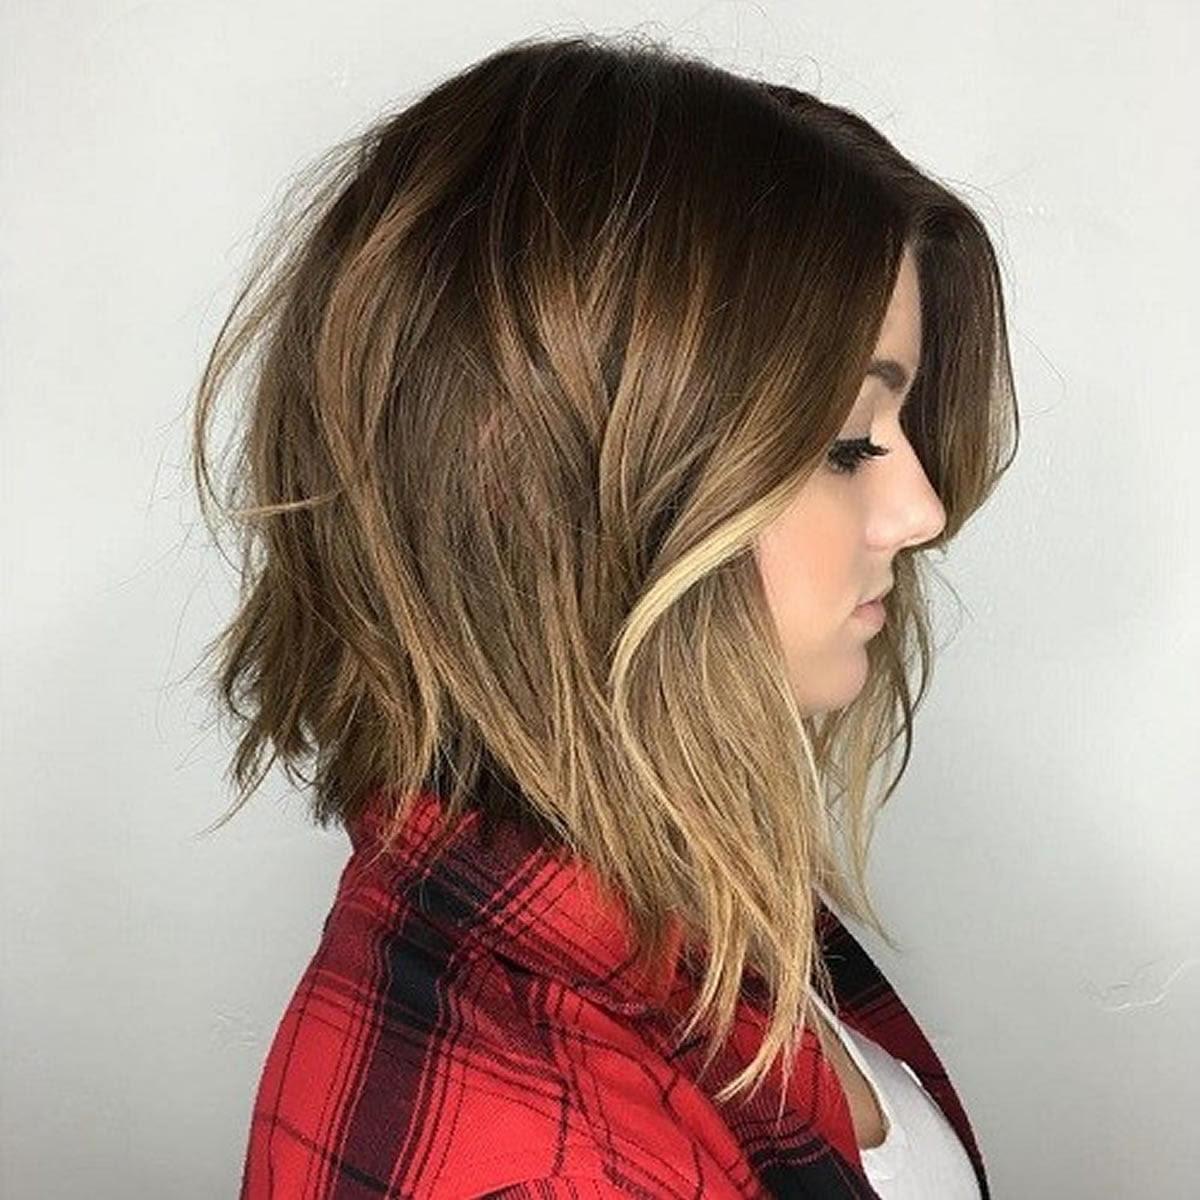 Bob Hairstyles for 2018 Inspiring 60 Long Bob Haircut Ideas – HAIRSTYLES